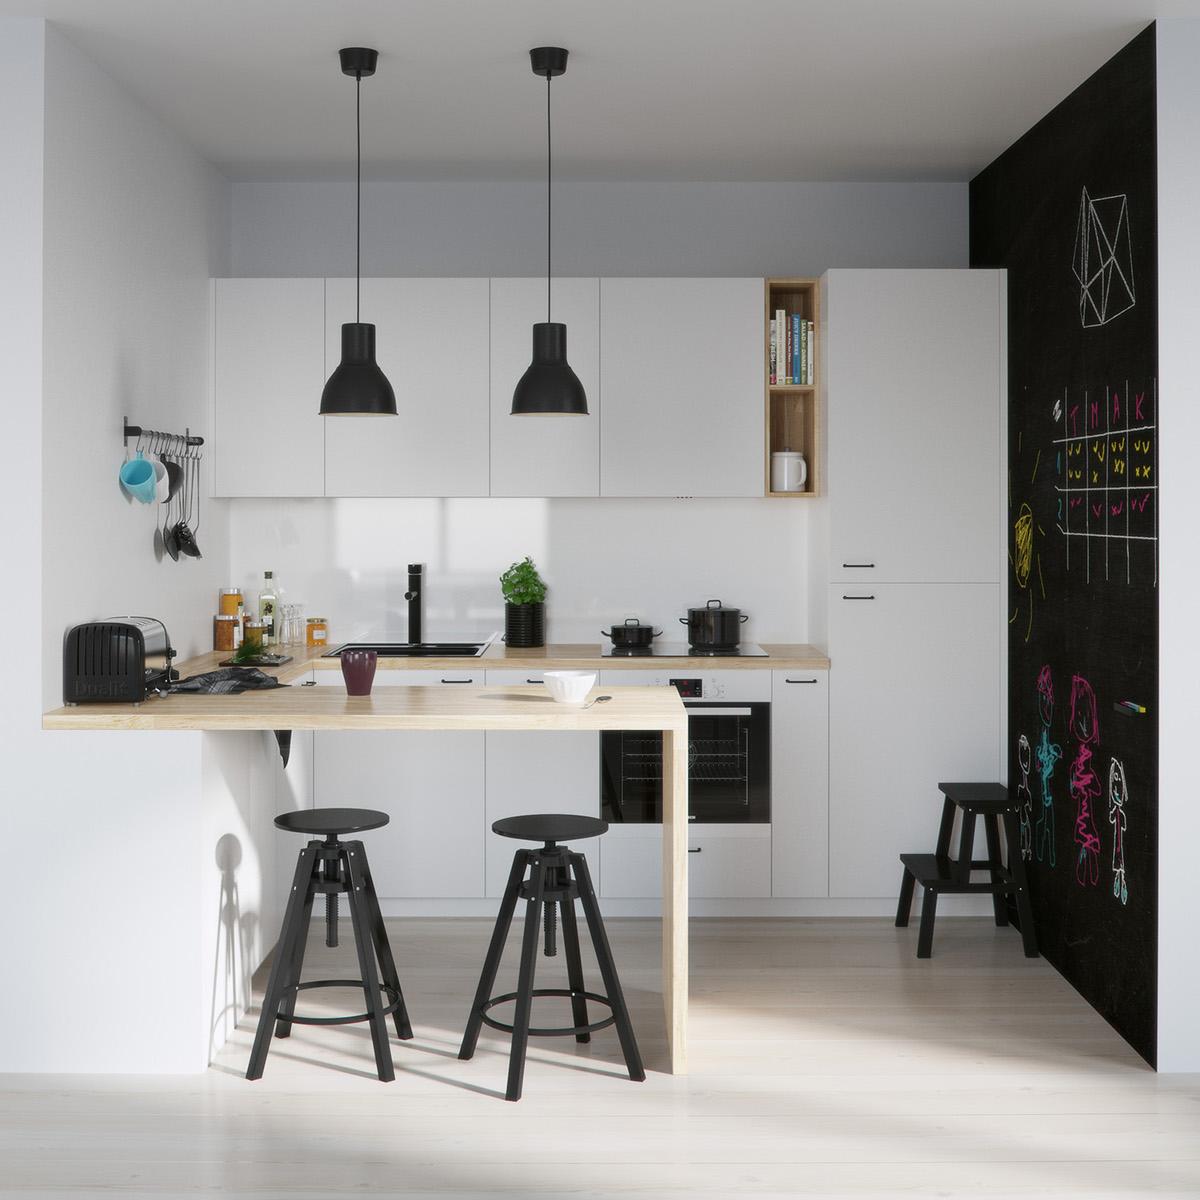 Desain Interior Dapur Skandinavia Bertema Monokrom – source: pinterest.com